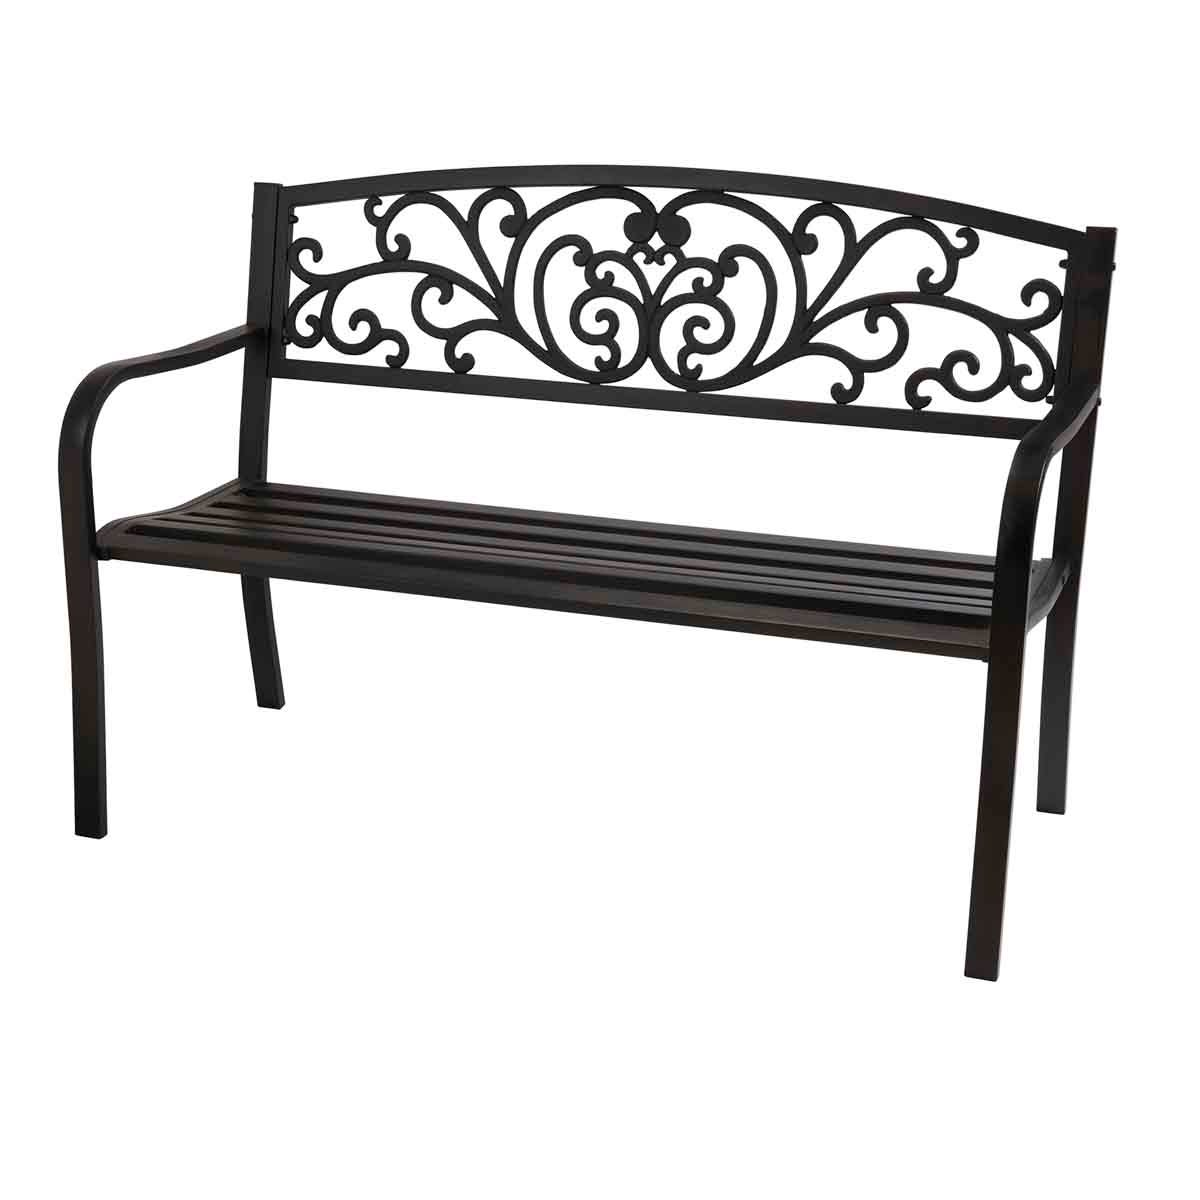 Garden Gear Henley Park Bench - Black